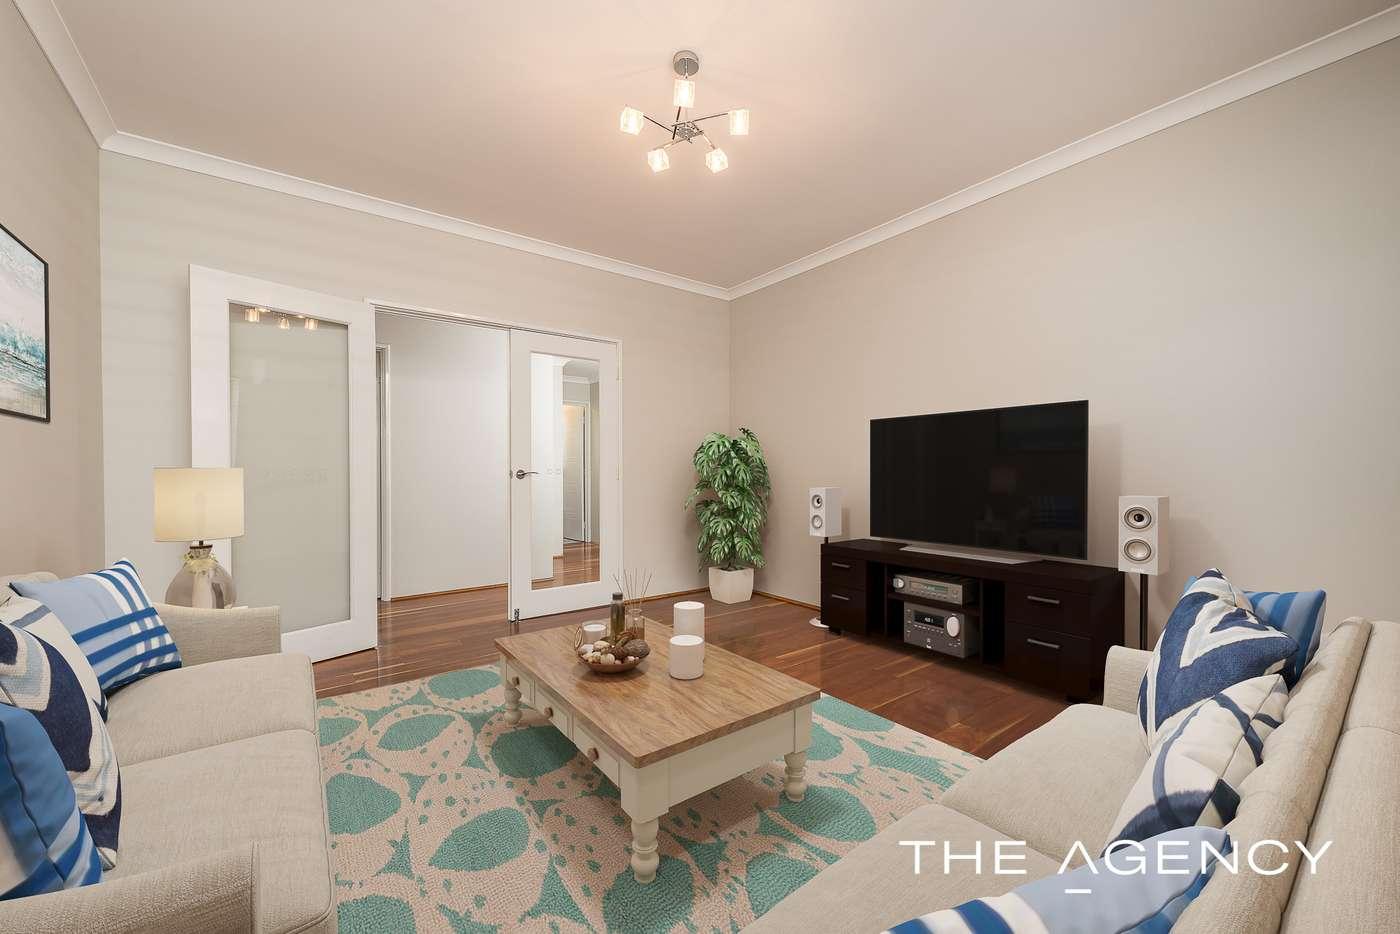 Sixth view of Homely house listing, 12 Scrubwren Circuit, Alkimos WA 6038